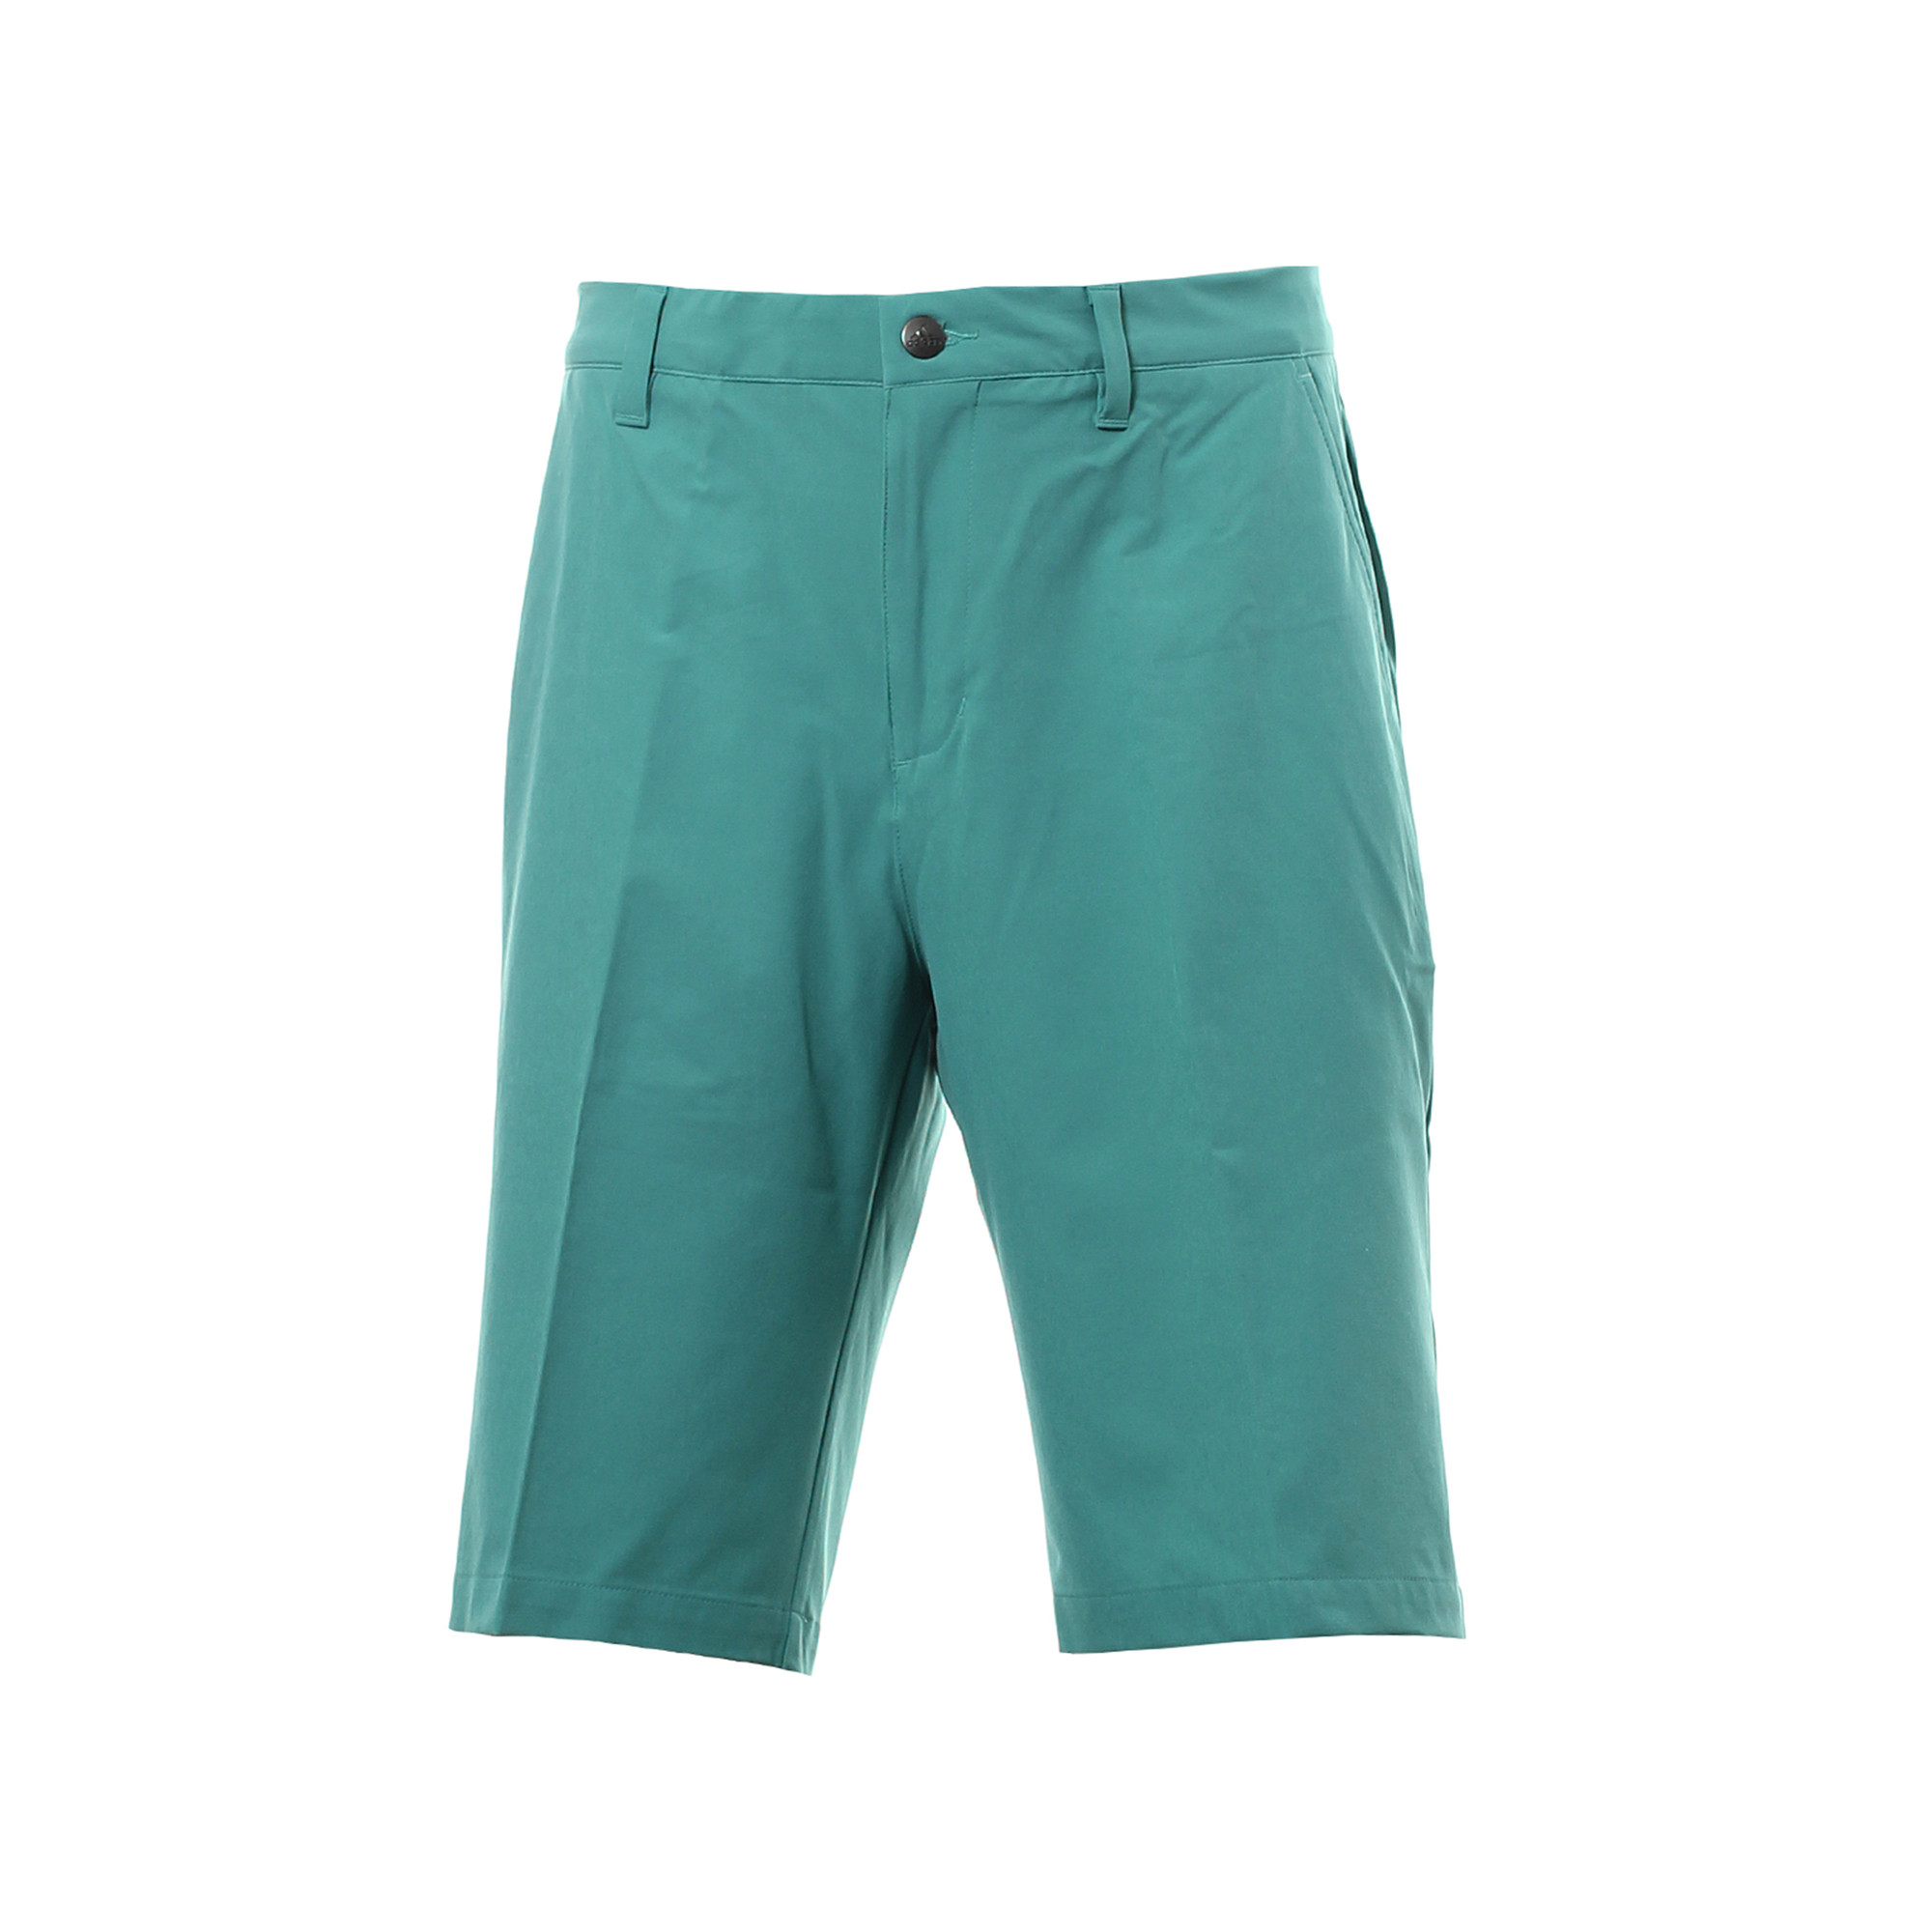 Adidas Men's Ultimate365 Green Shorts